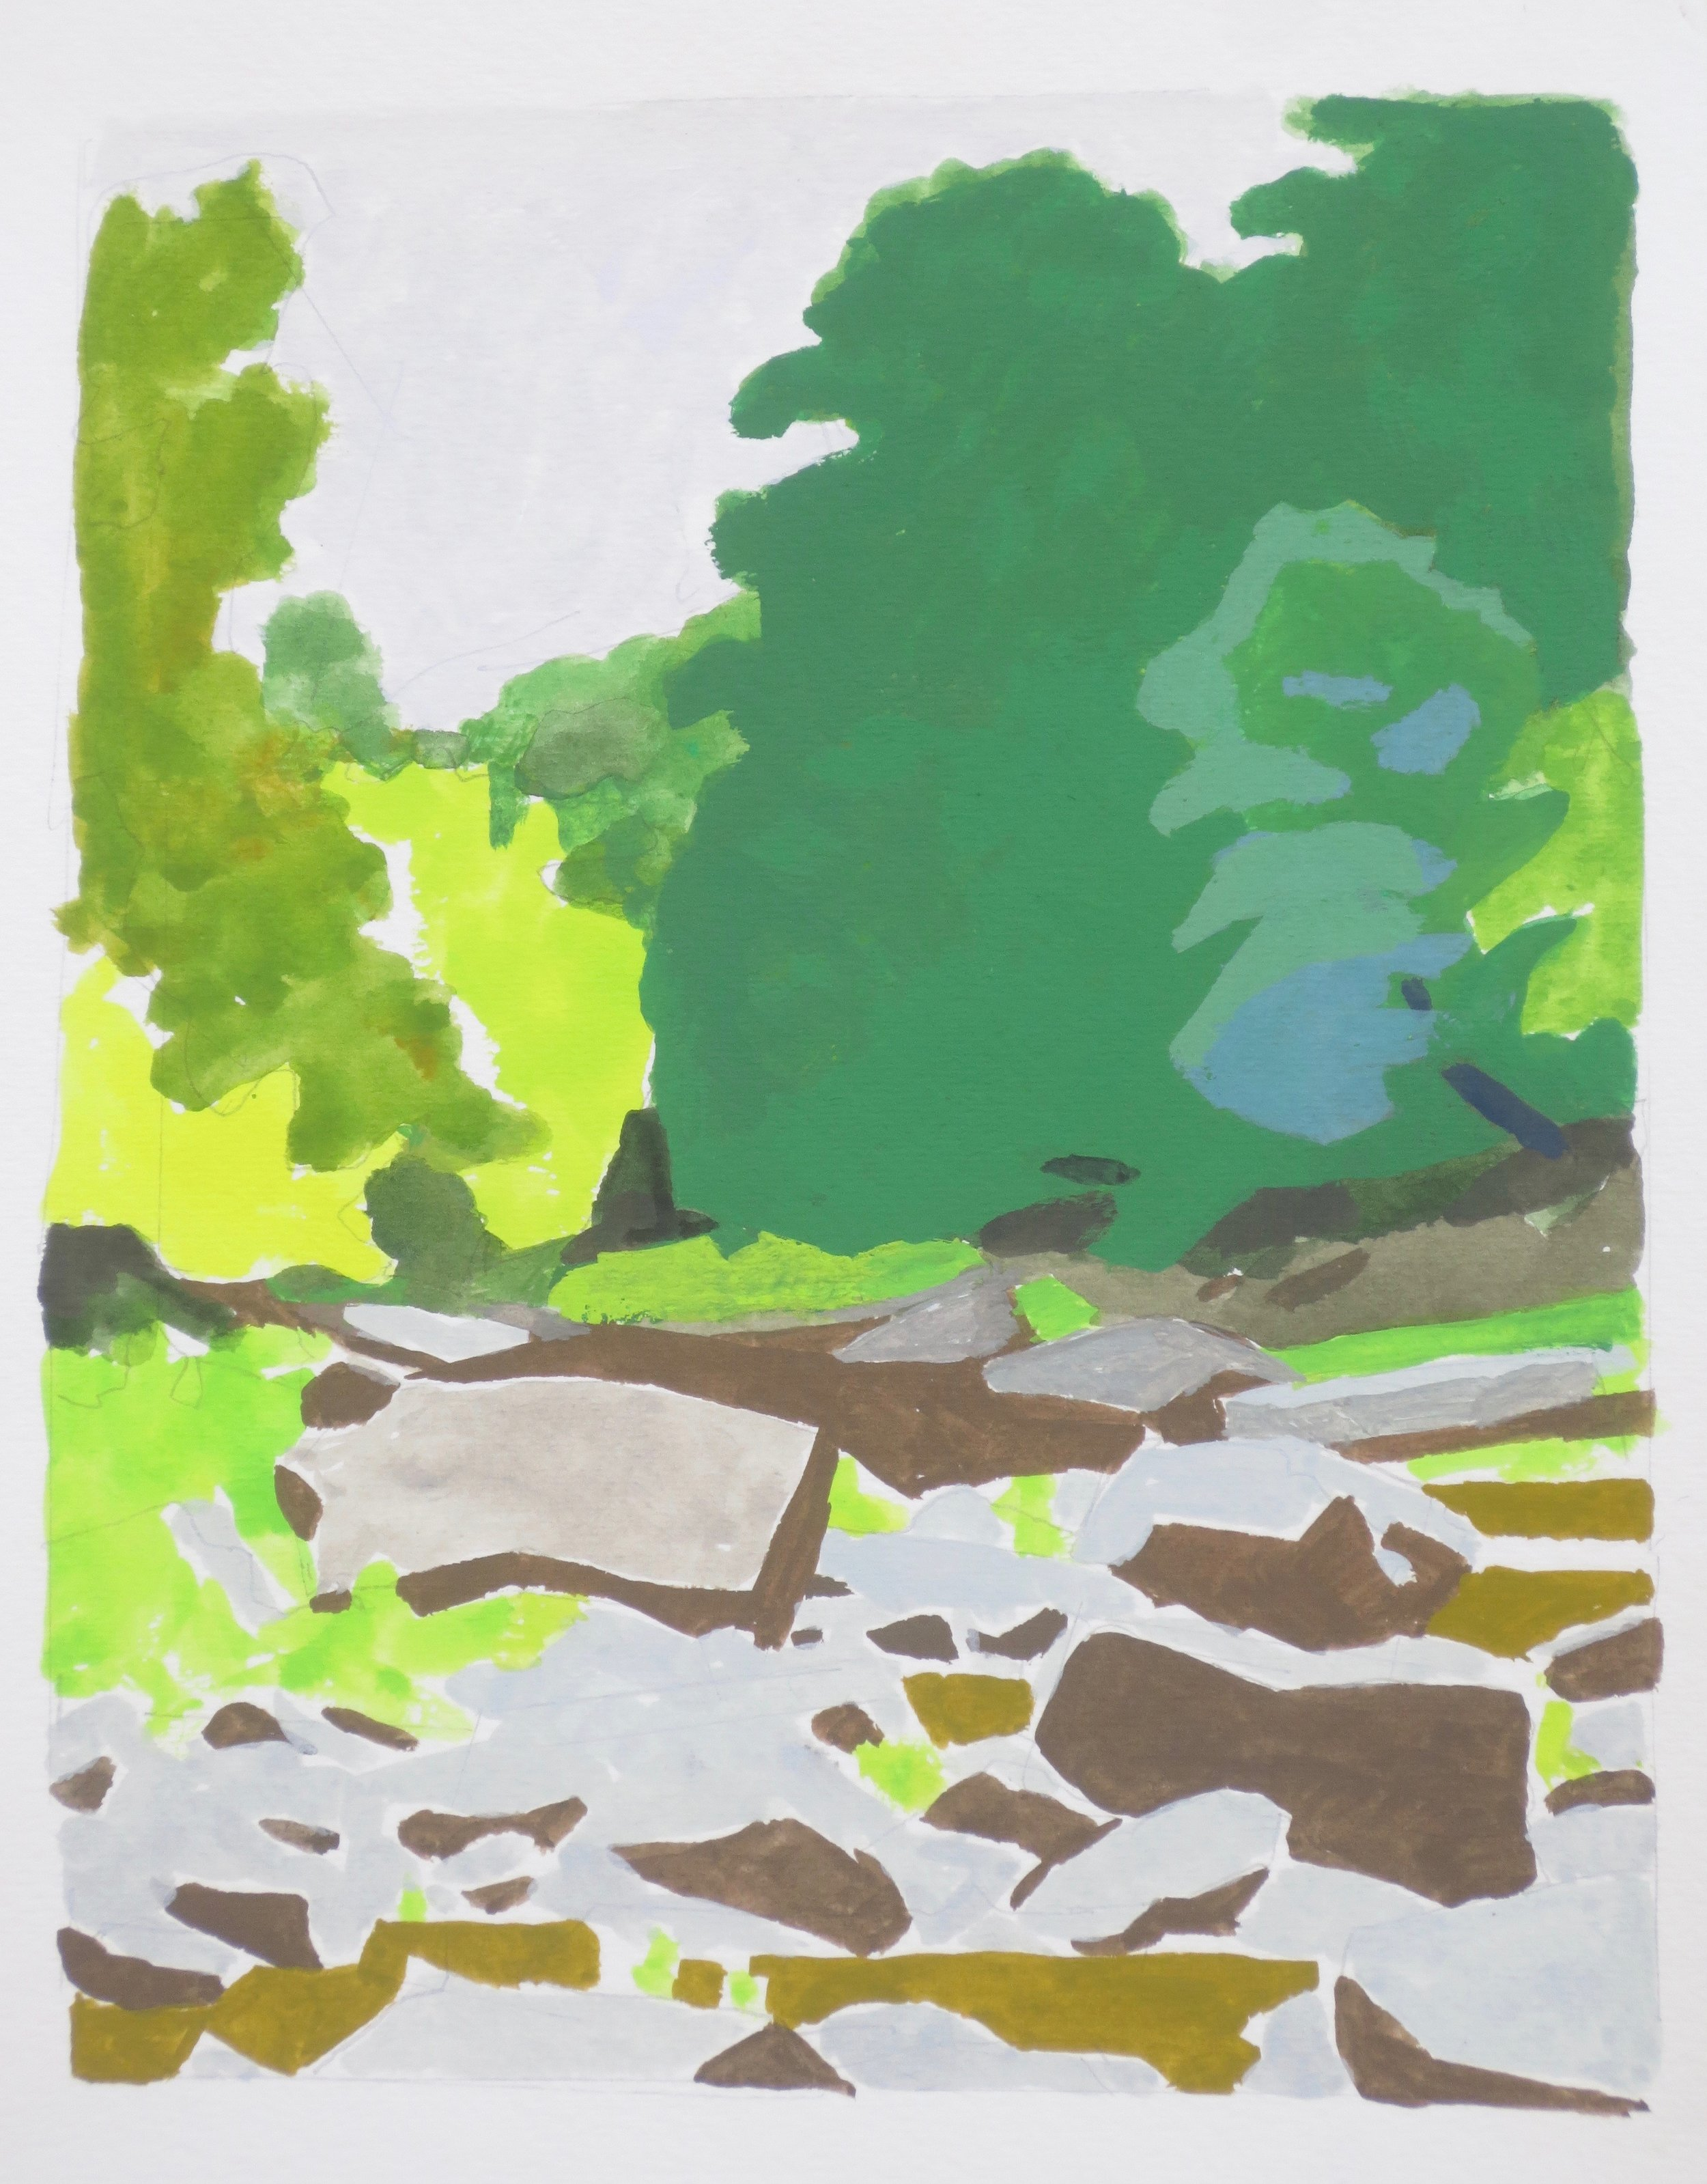 Riverbed Rocks, 2016